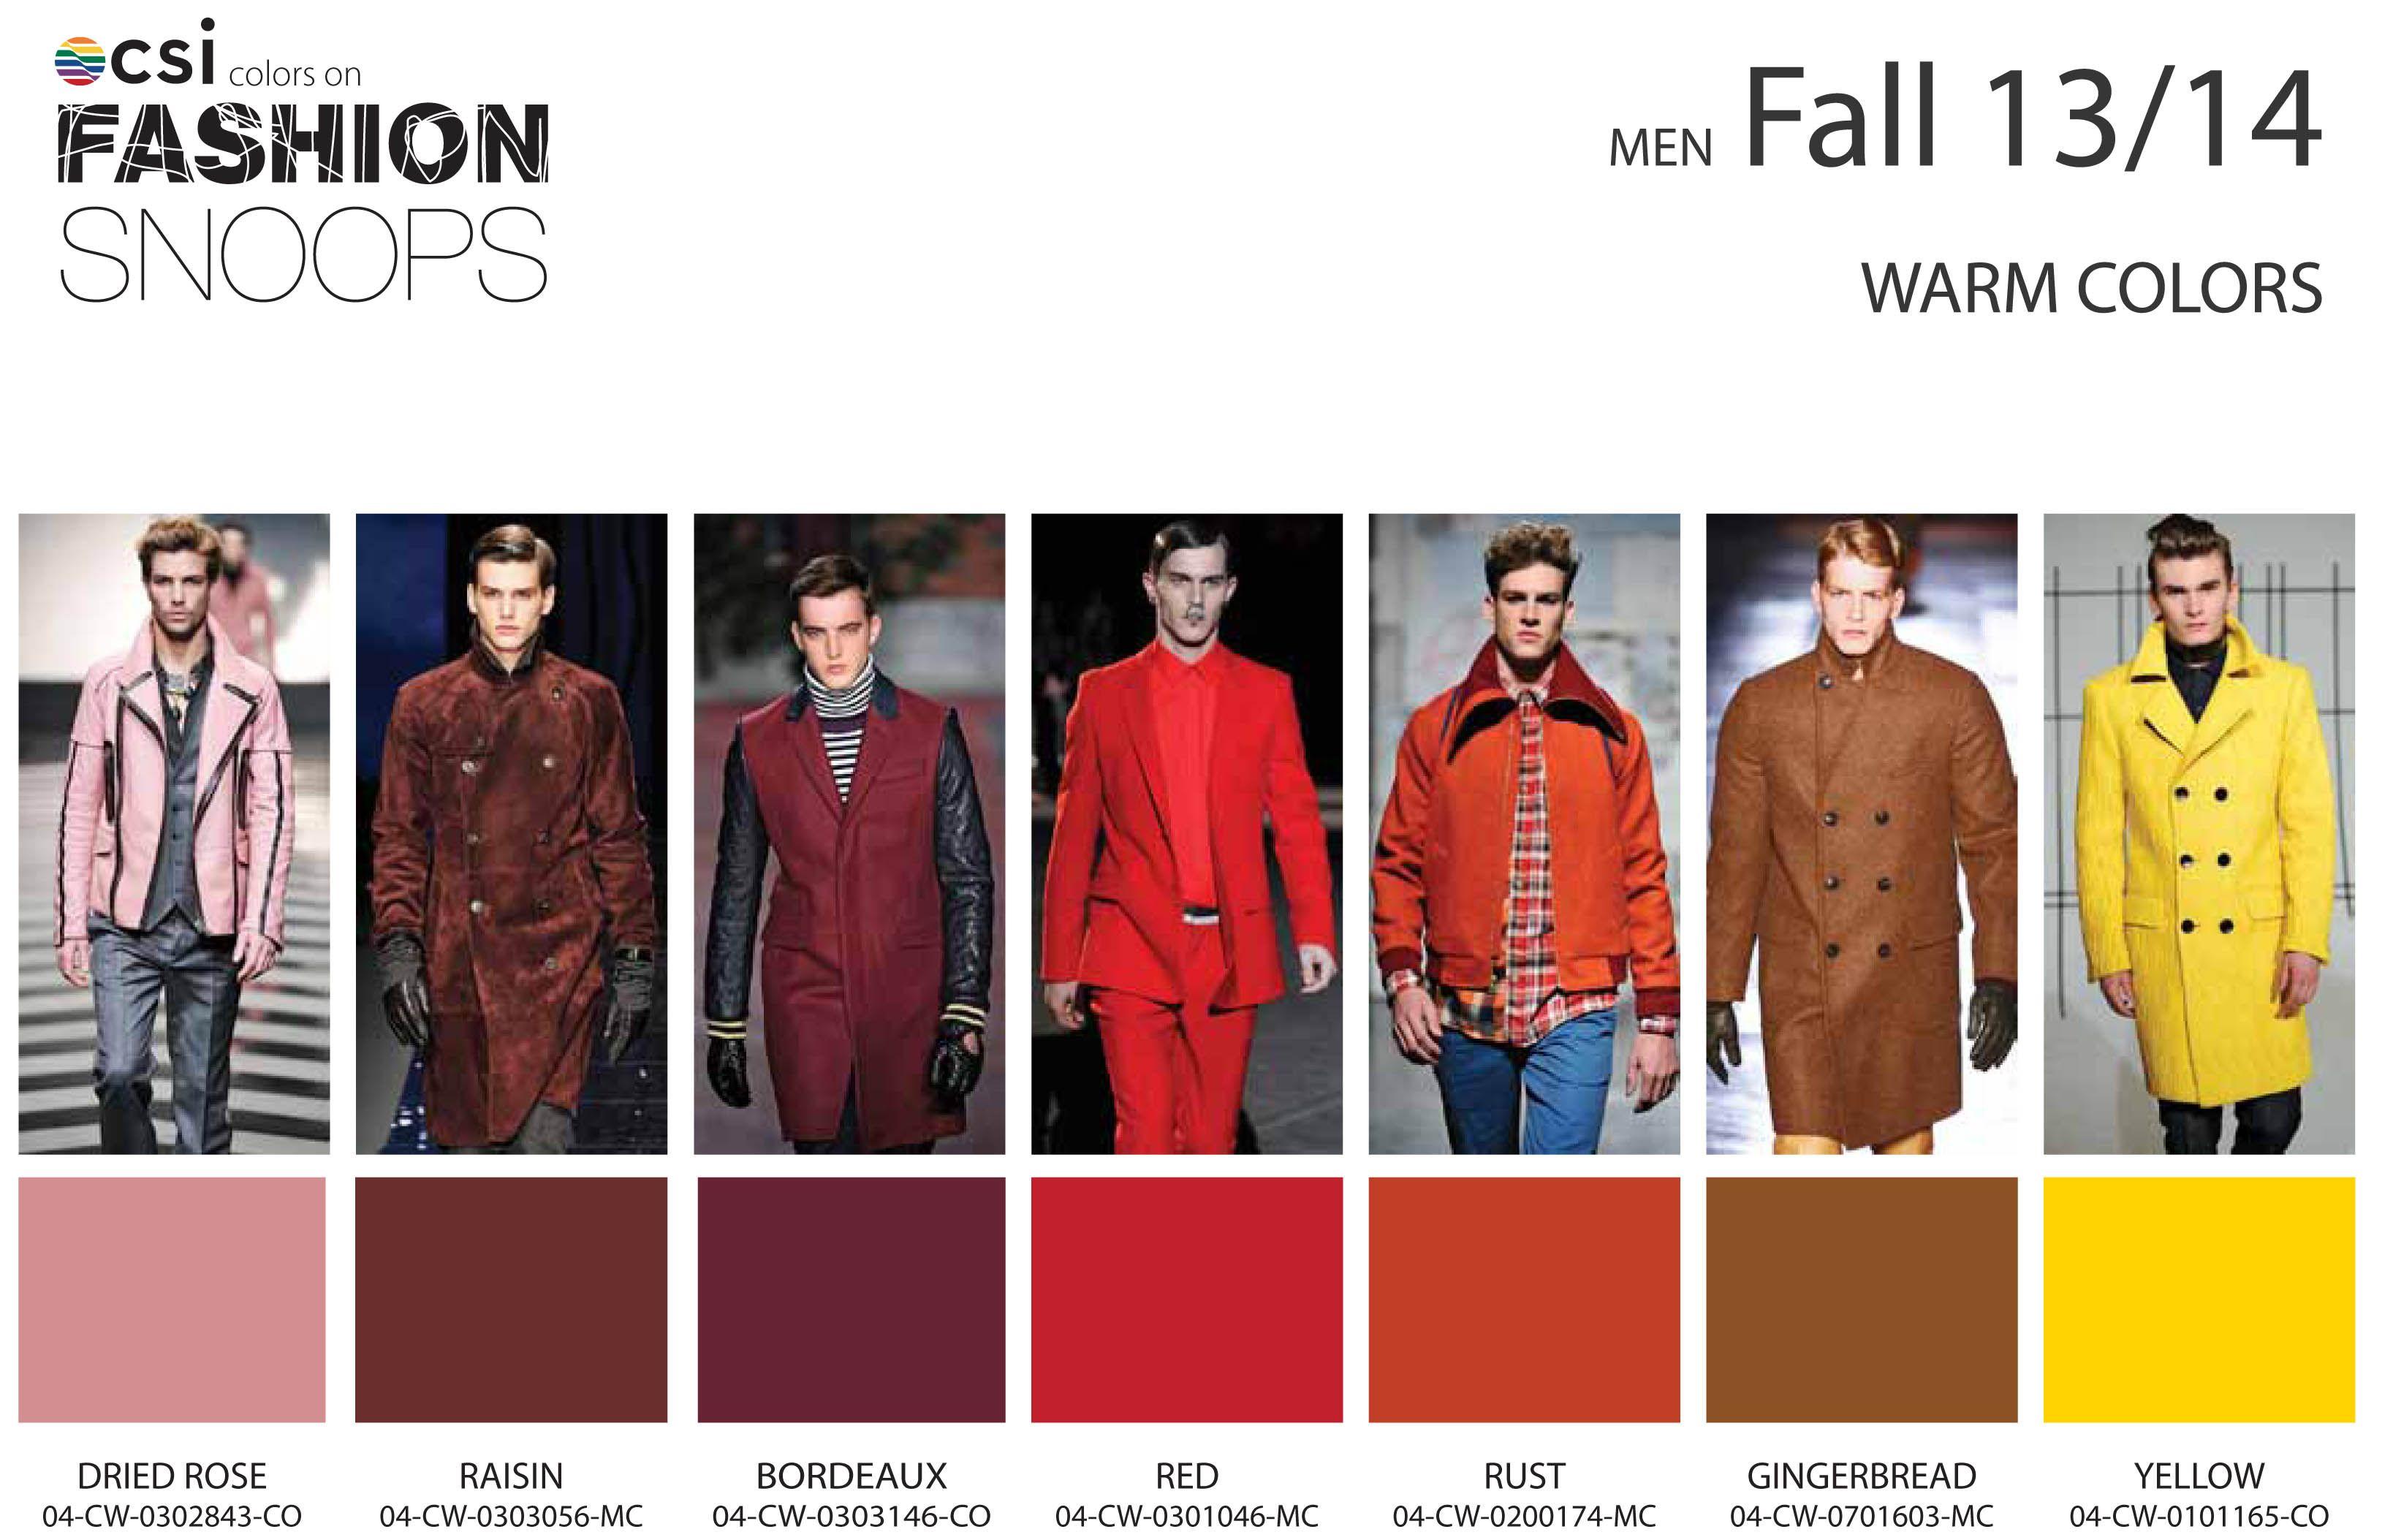 Fall/Winter 2013/2014 Runway Color Trends